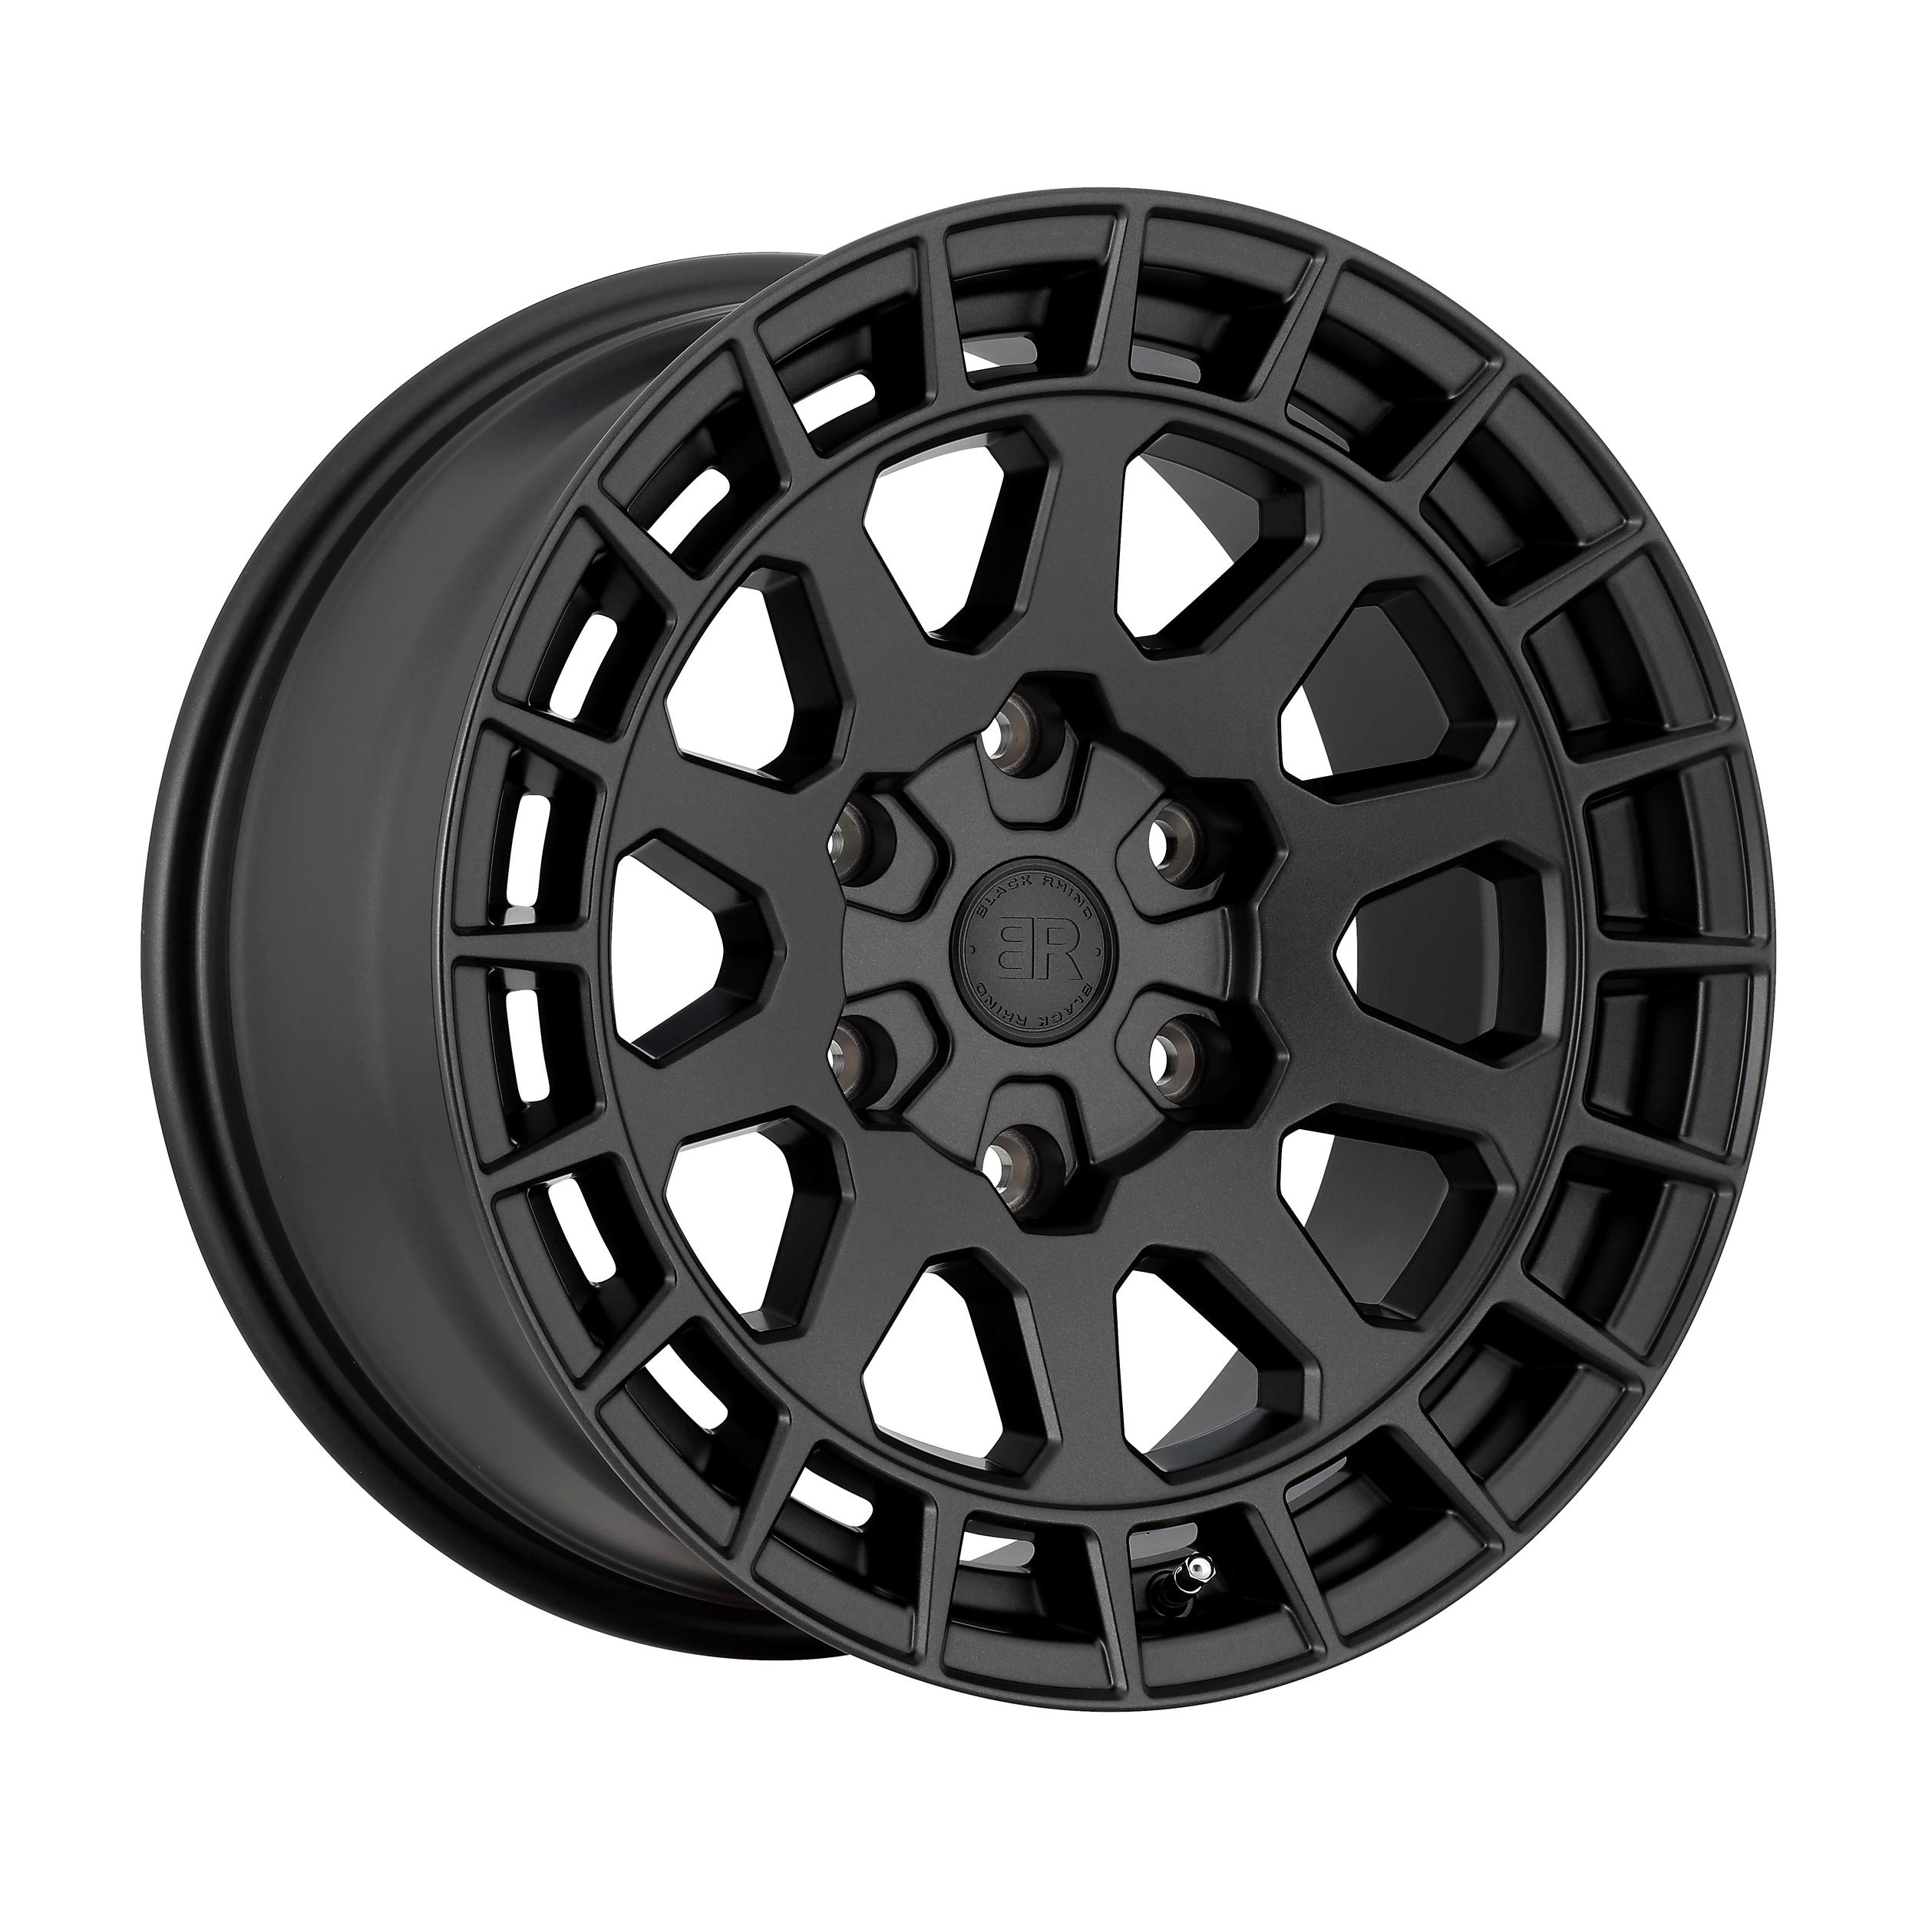 17″ BLACK RHINO BOXER ET12 AND BFGOODRICH KO2 2456517